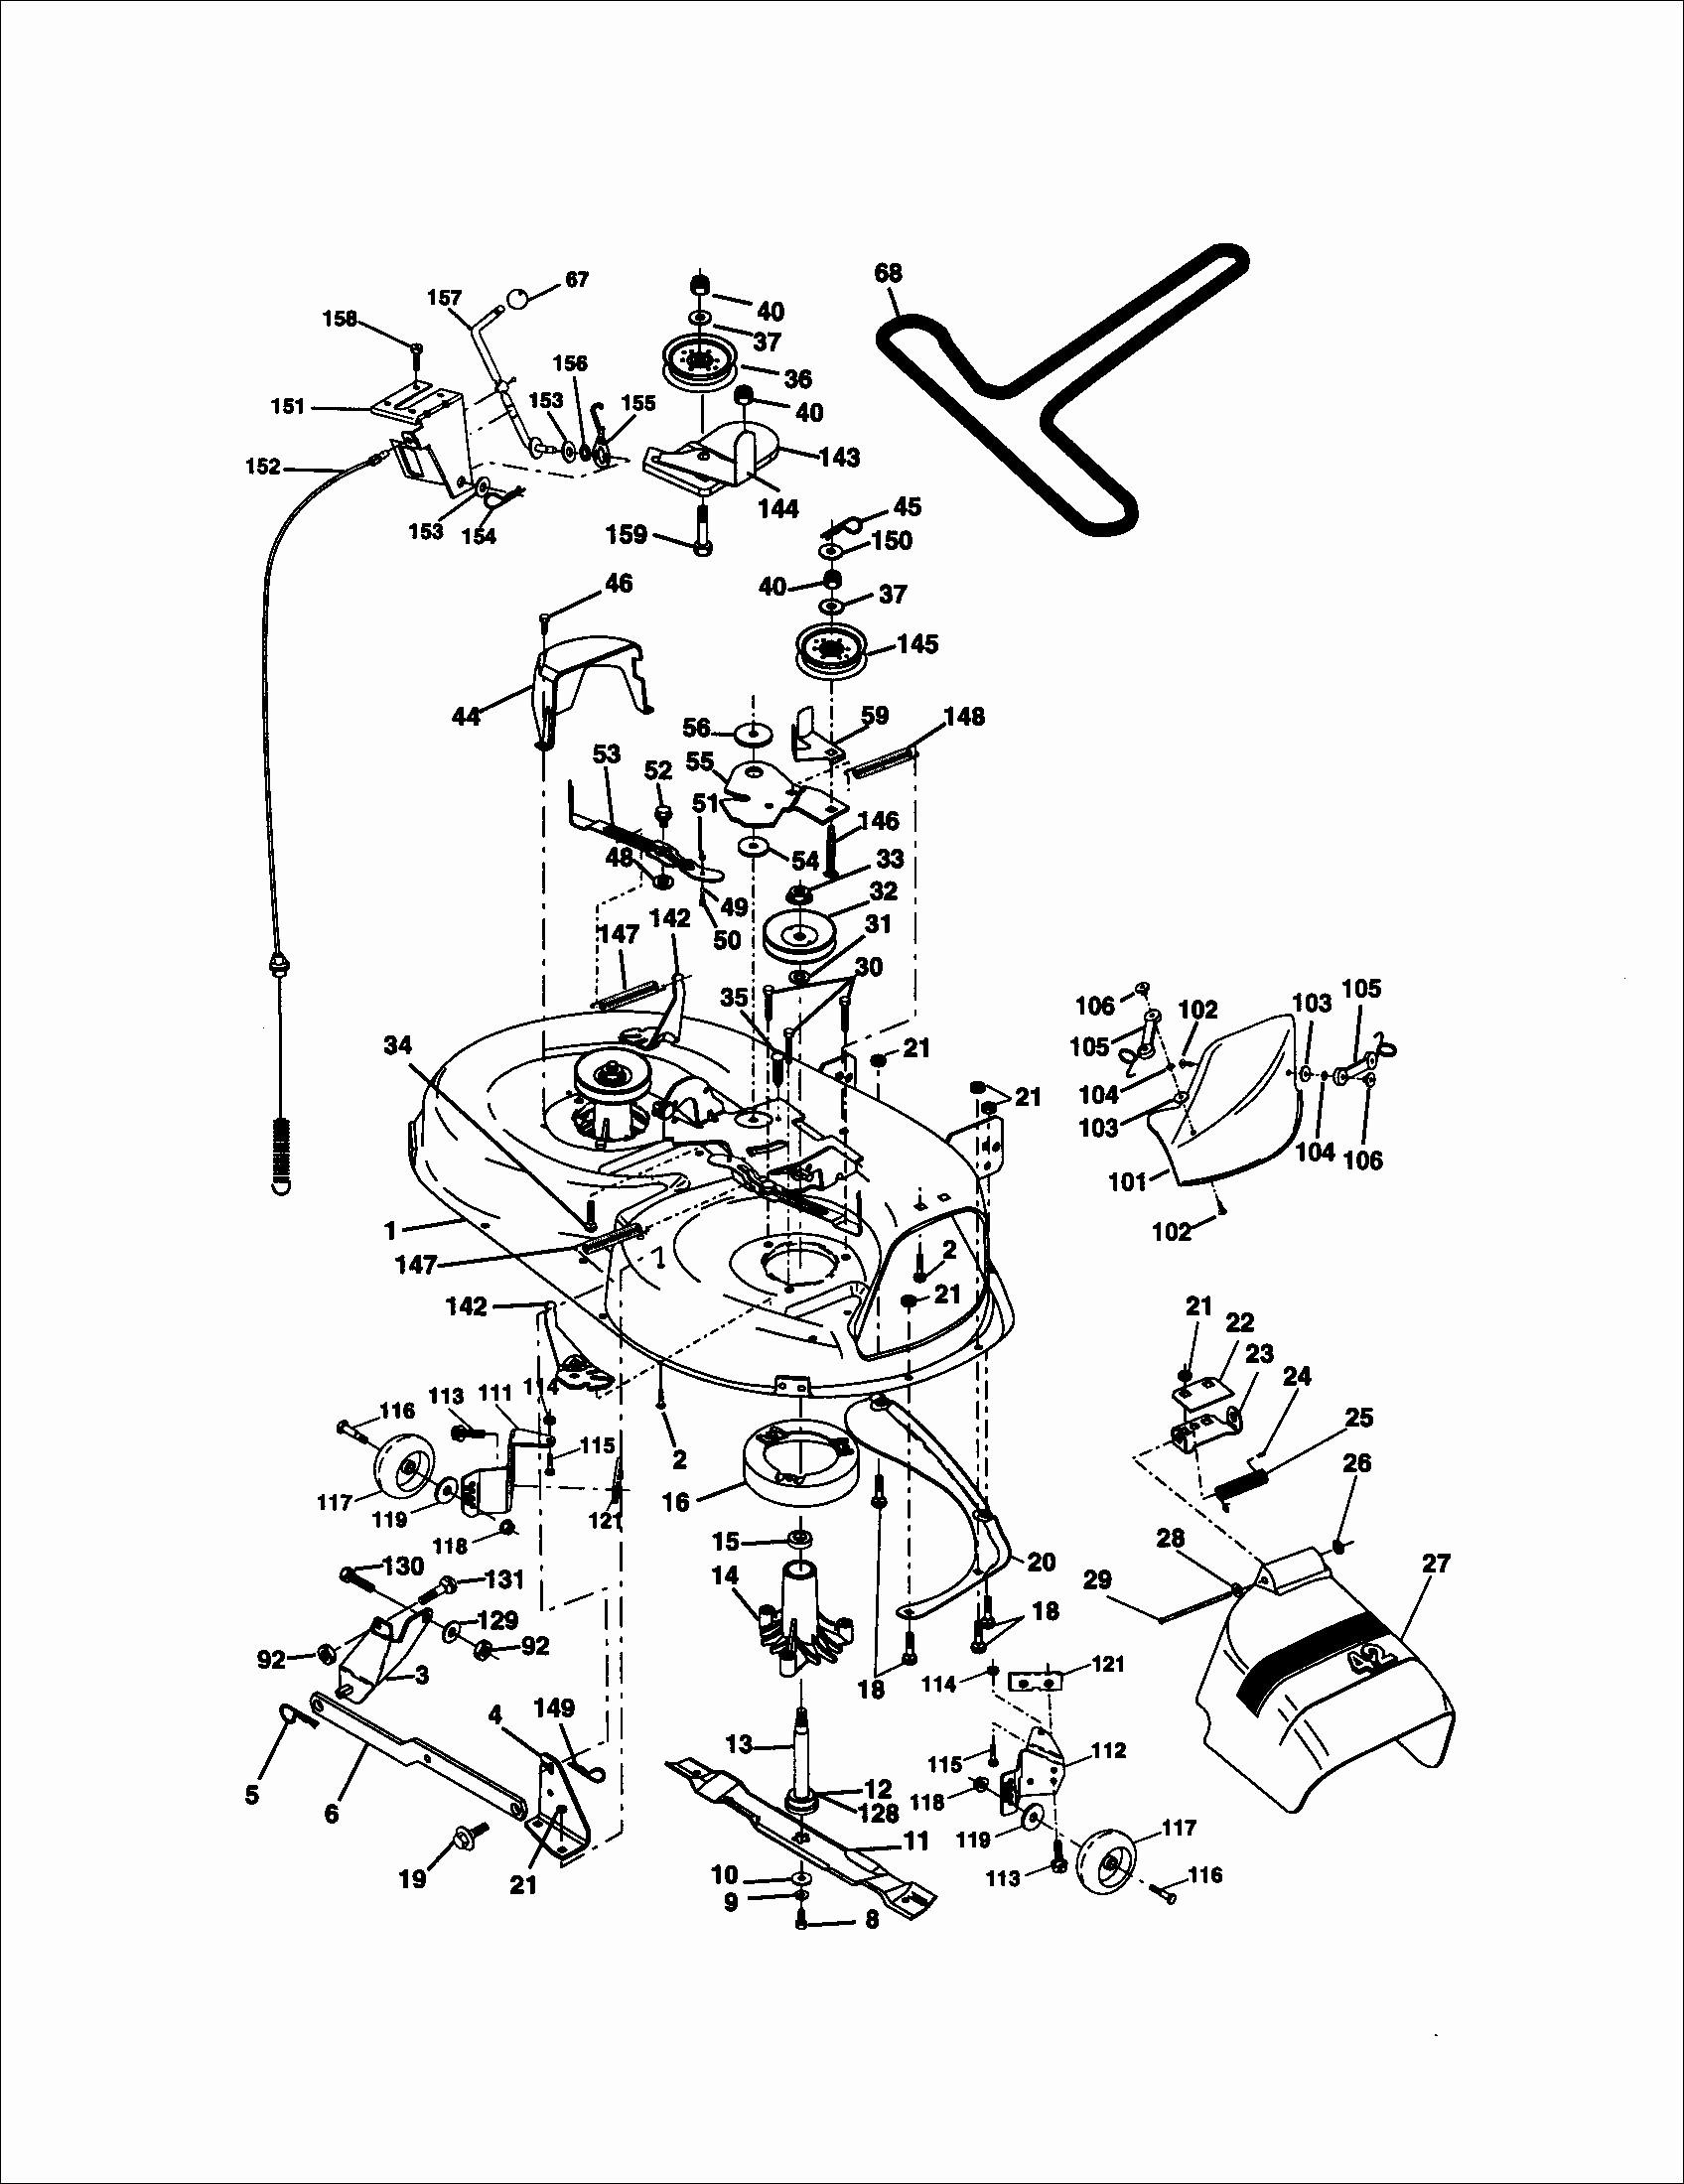 Briggs and Stratton 6 5 Hp Engine Diagram 2 Briggs and Stratton Wiring Diagram Beautiful Briggs Stratton Engine Of Briggs and Stratton 6 5 Hp Engine Diagram 2